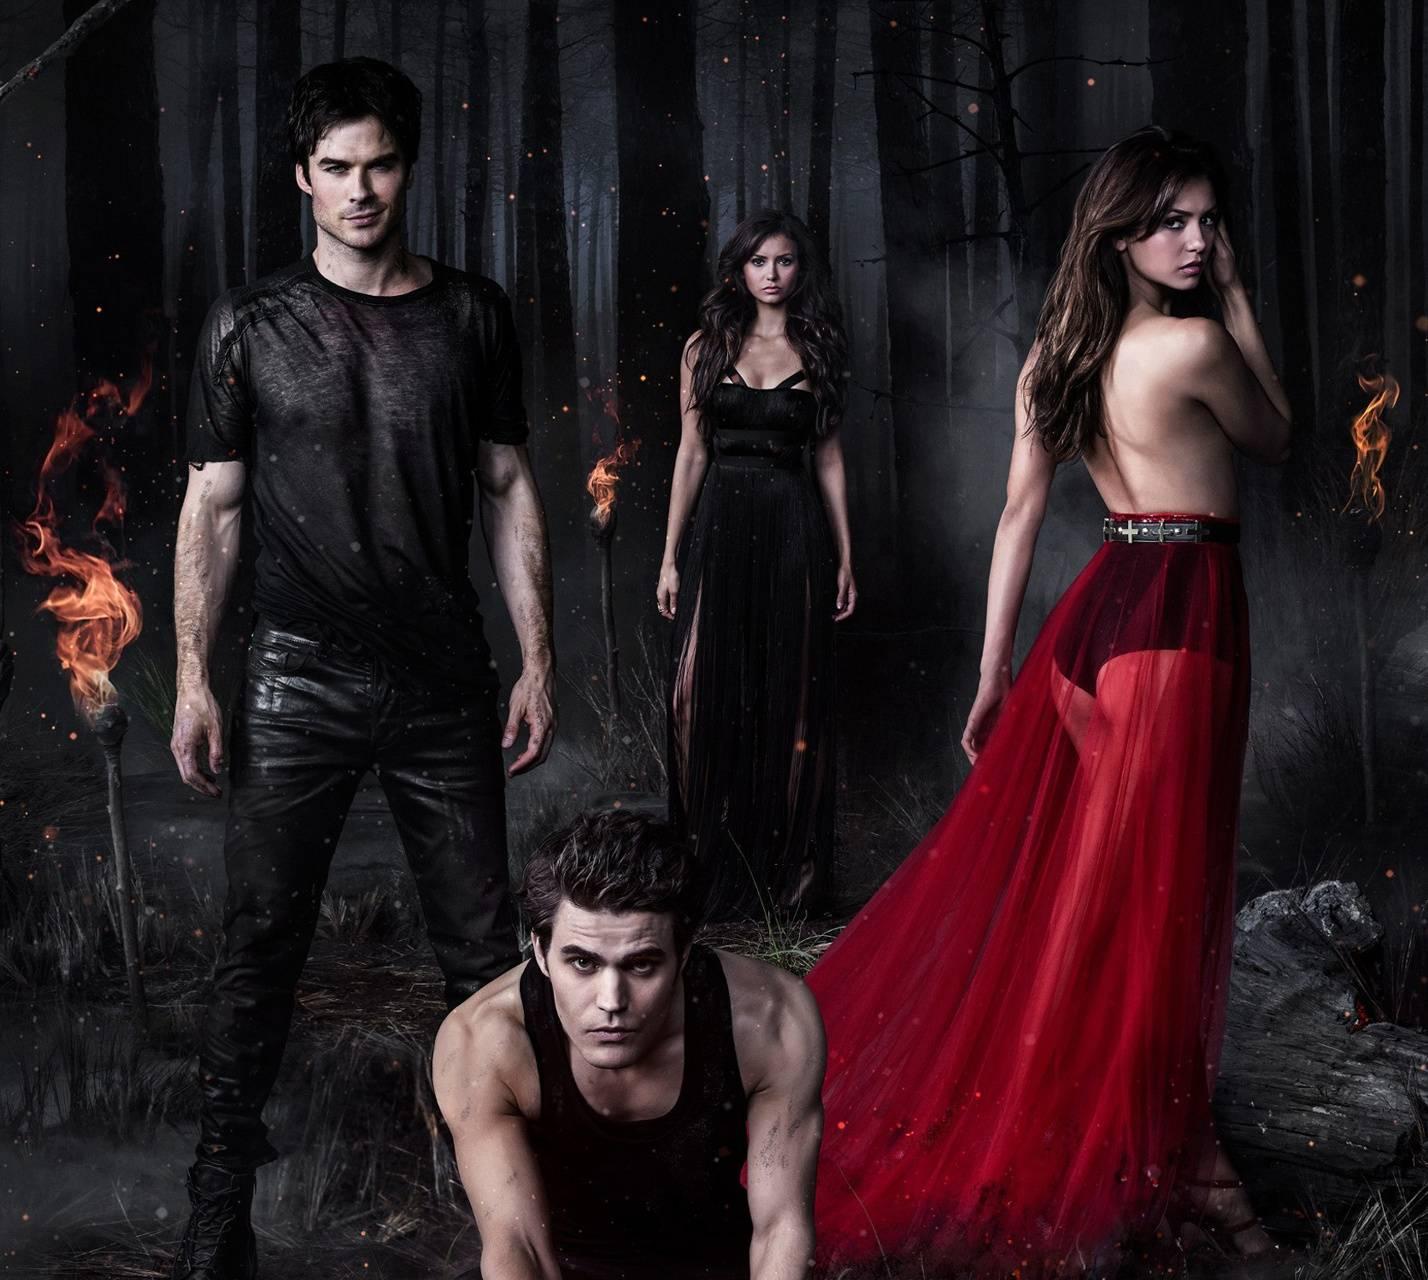 The Vamp Diaries